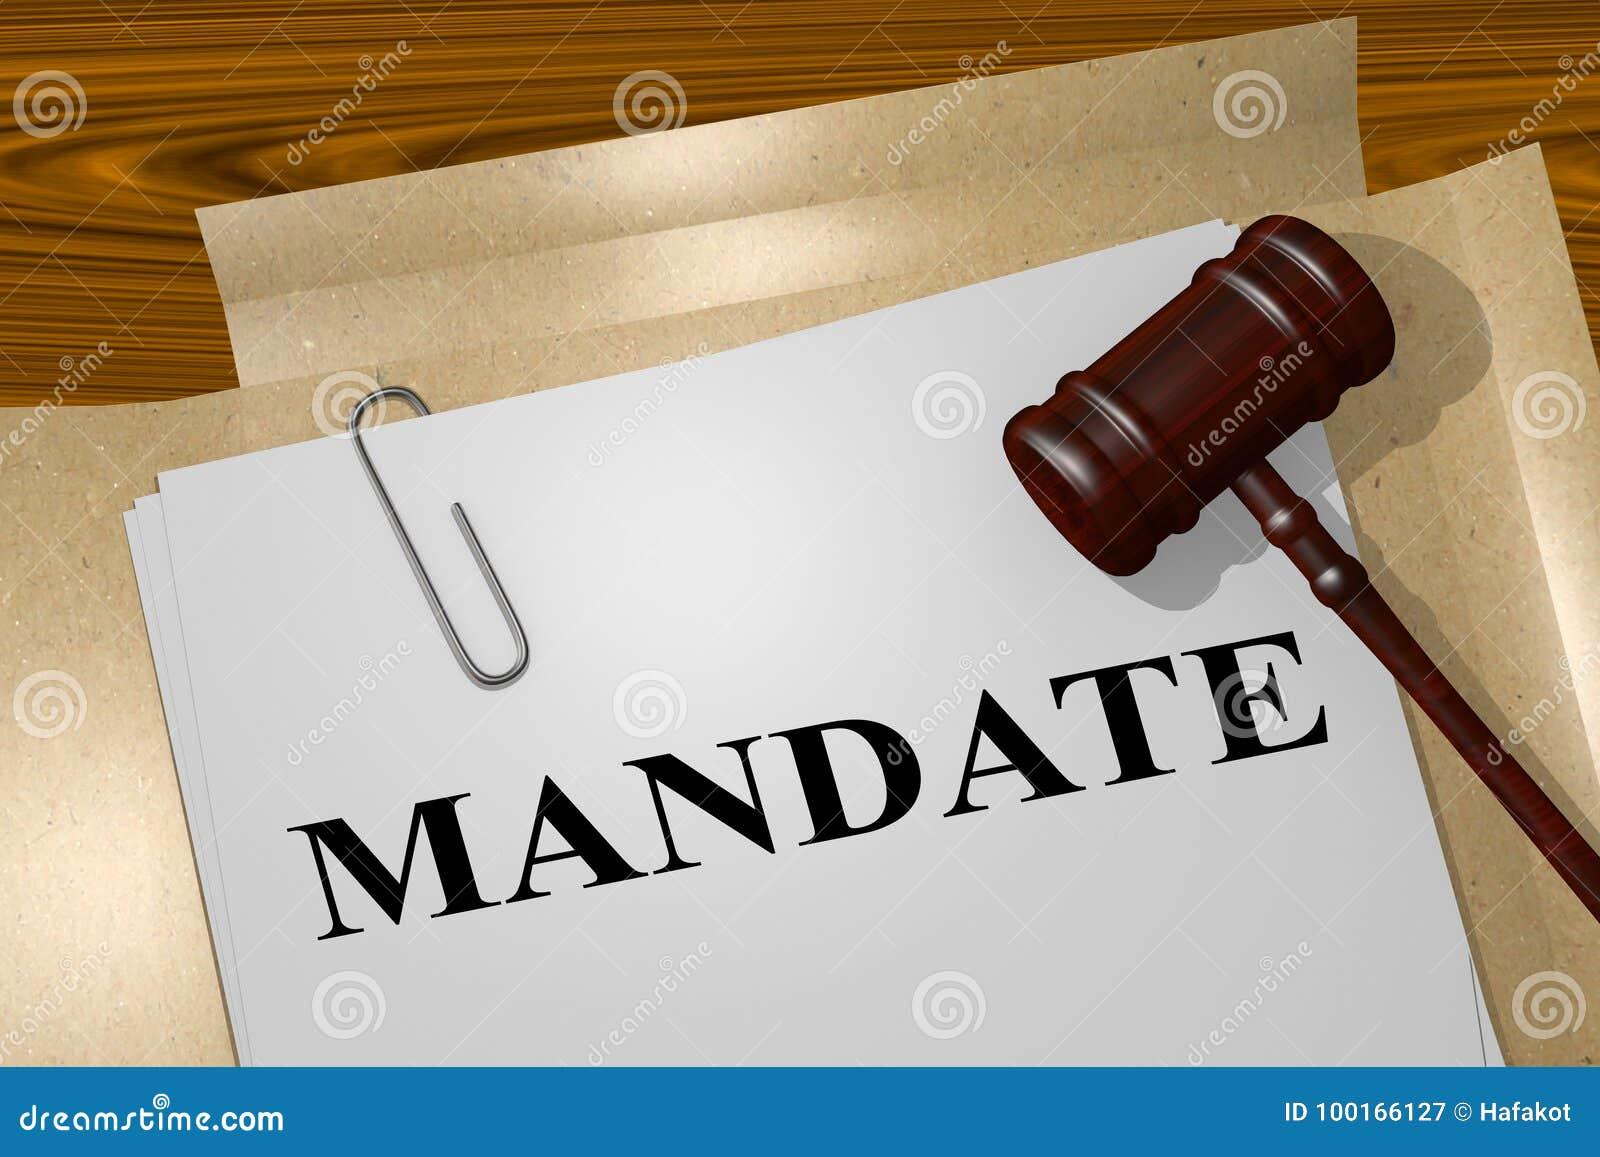 Mandate Stock Illustrations – 535 Mandate Stock ...